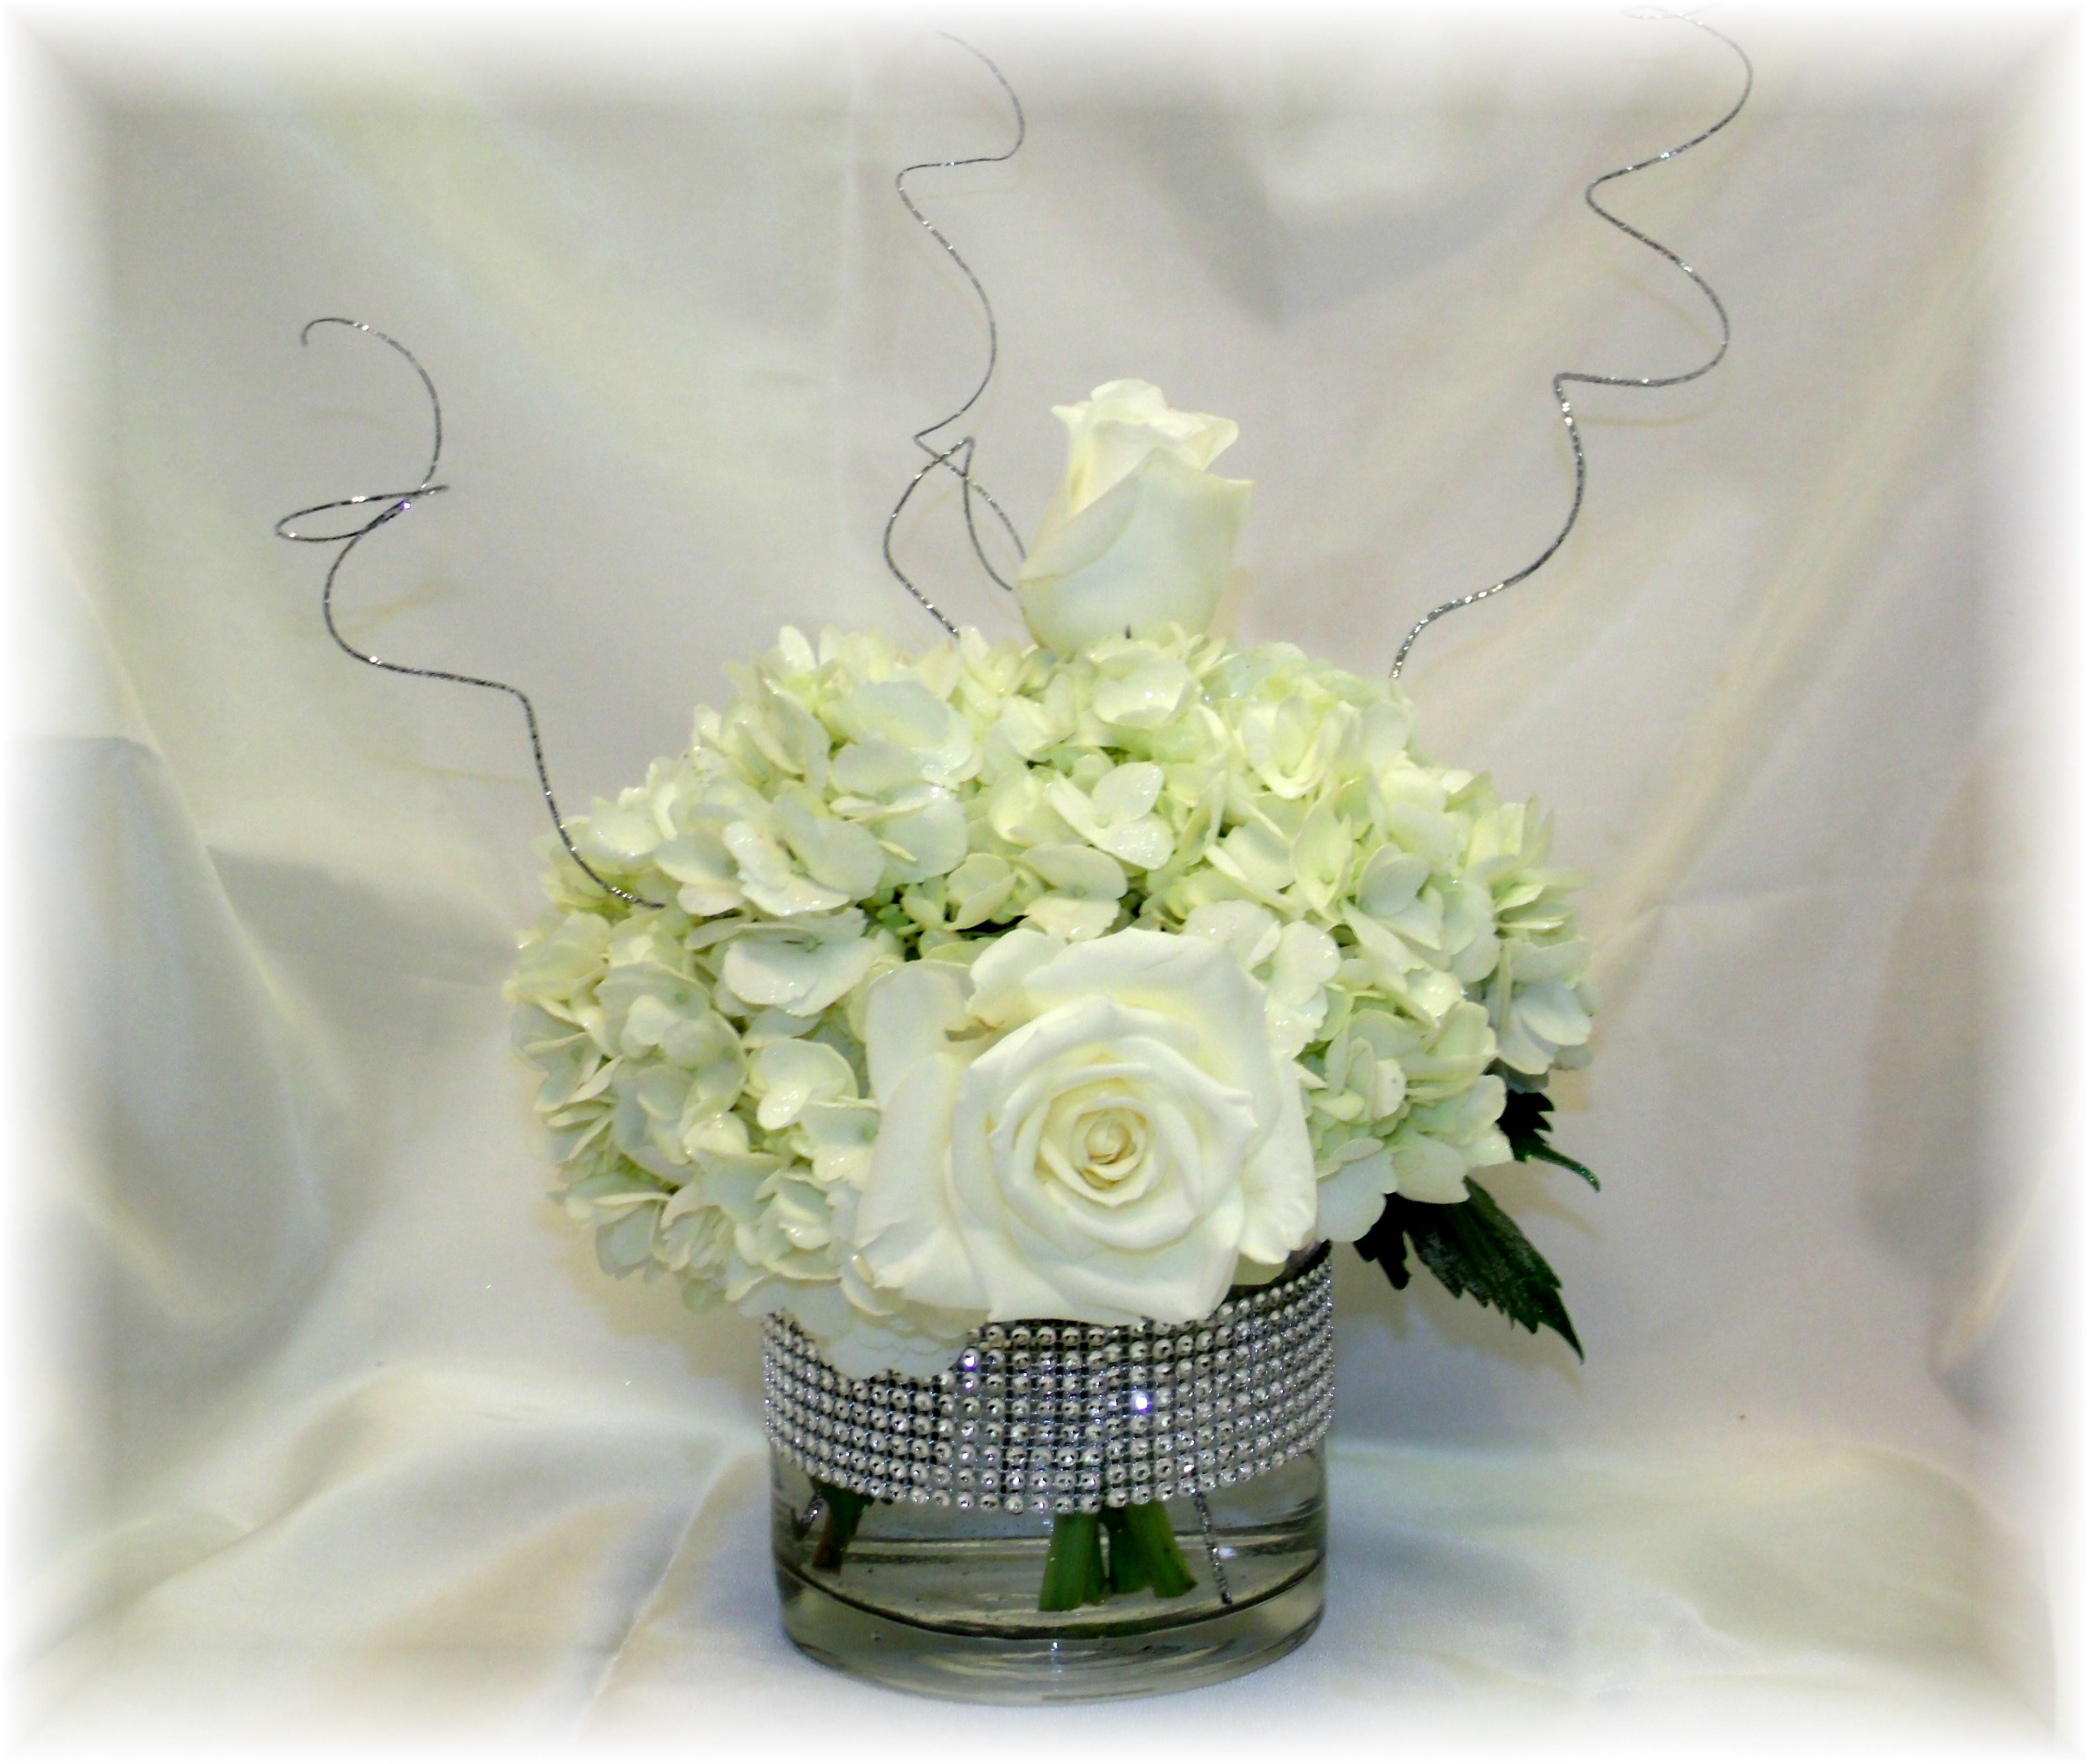 Centerpiece Hydrangea, Rose & Bling!